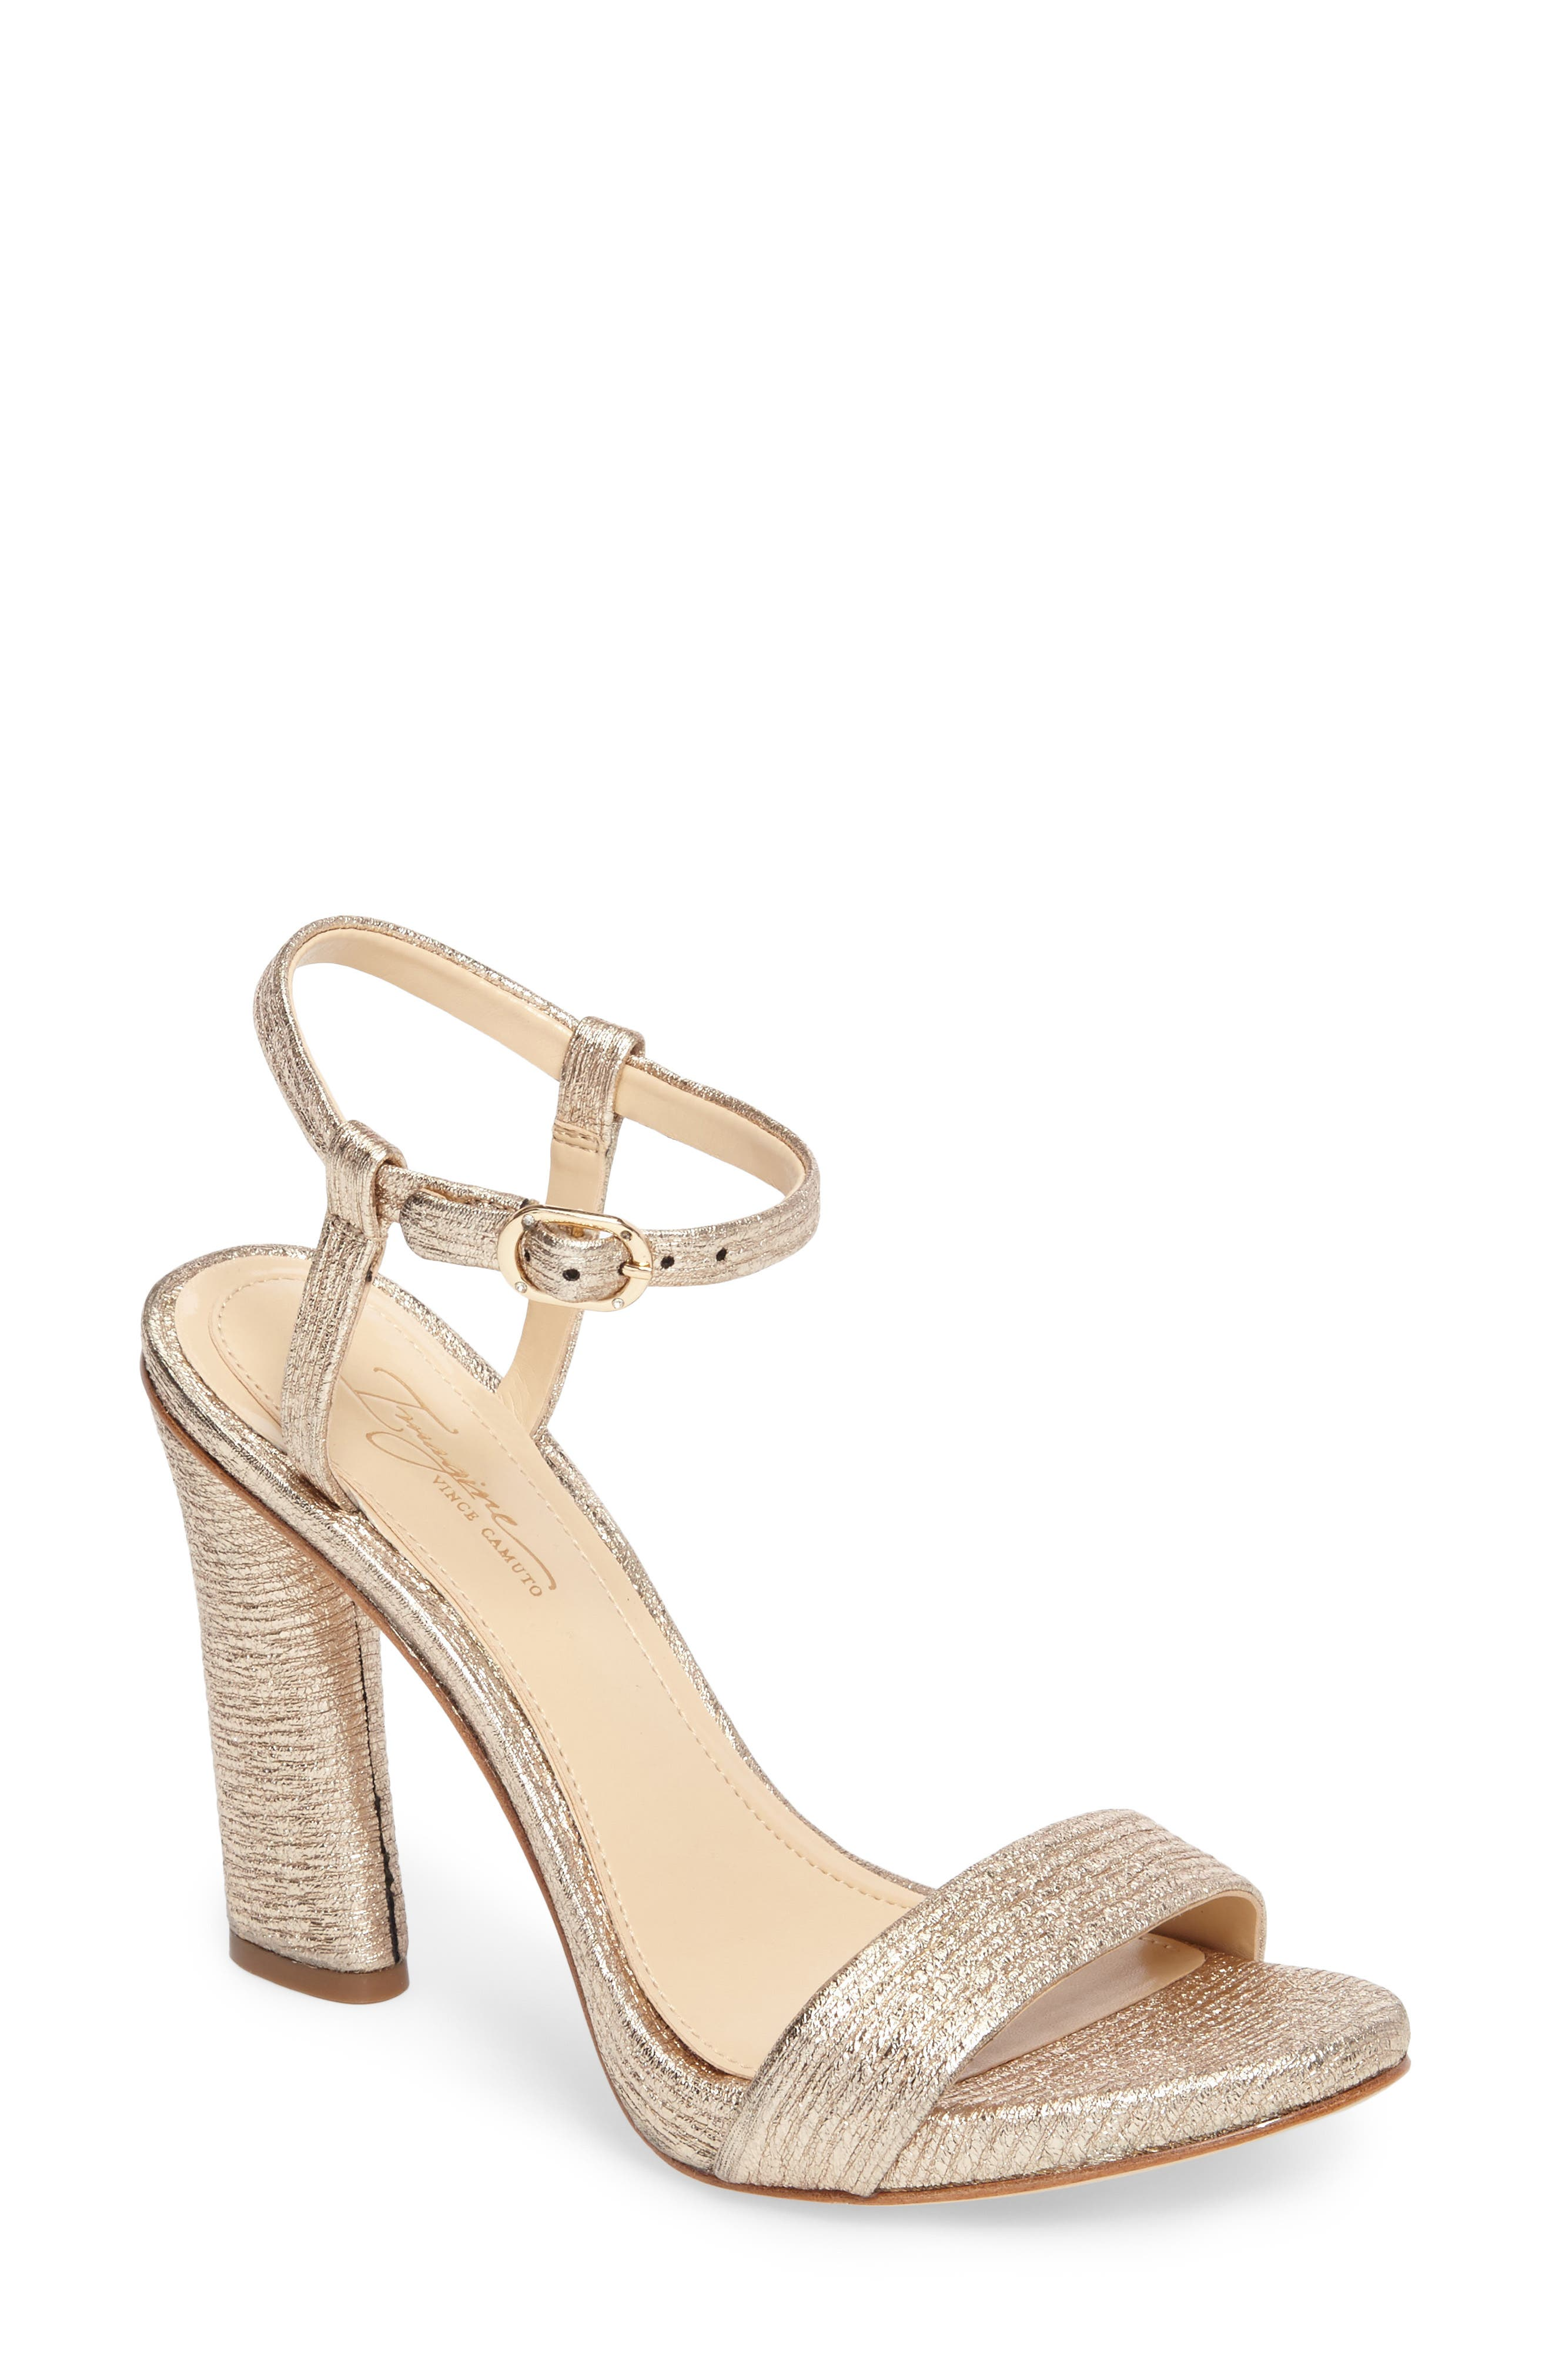 Imagine Vince Camuto Sune Sandal,                         Main,                         color, Soft Gold Leather